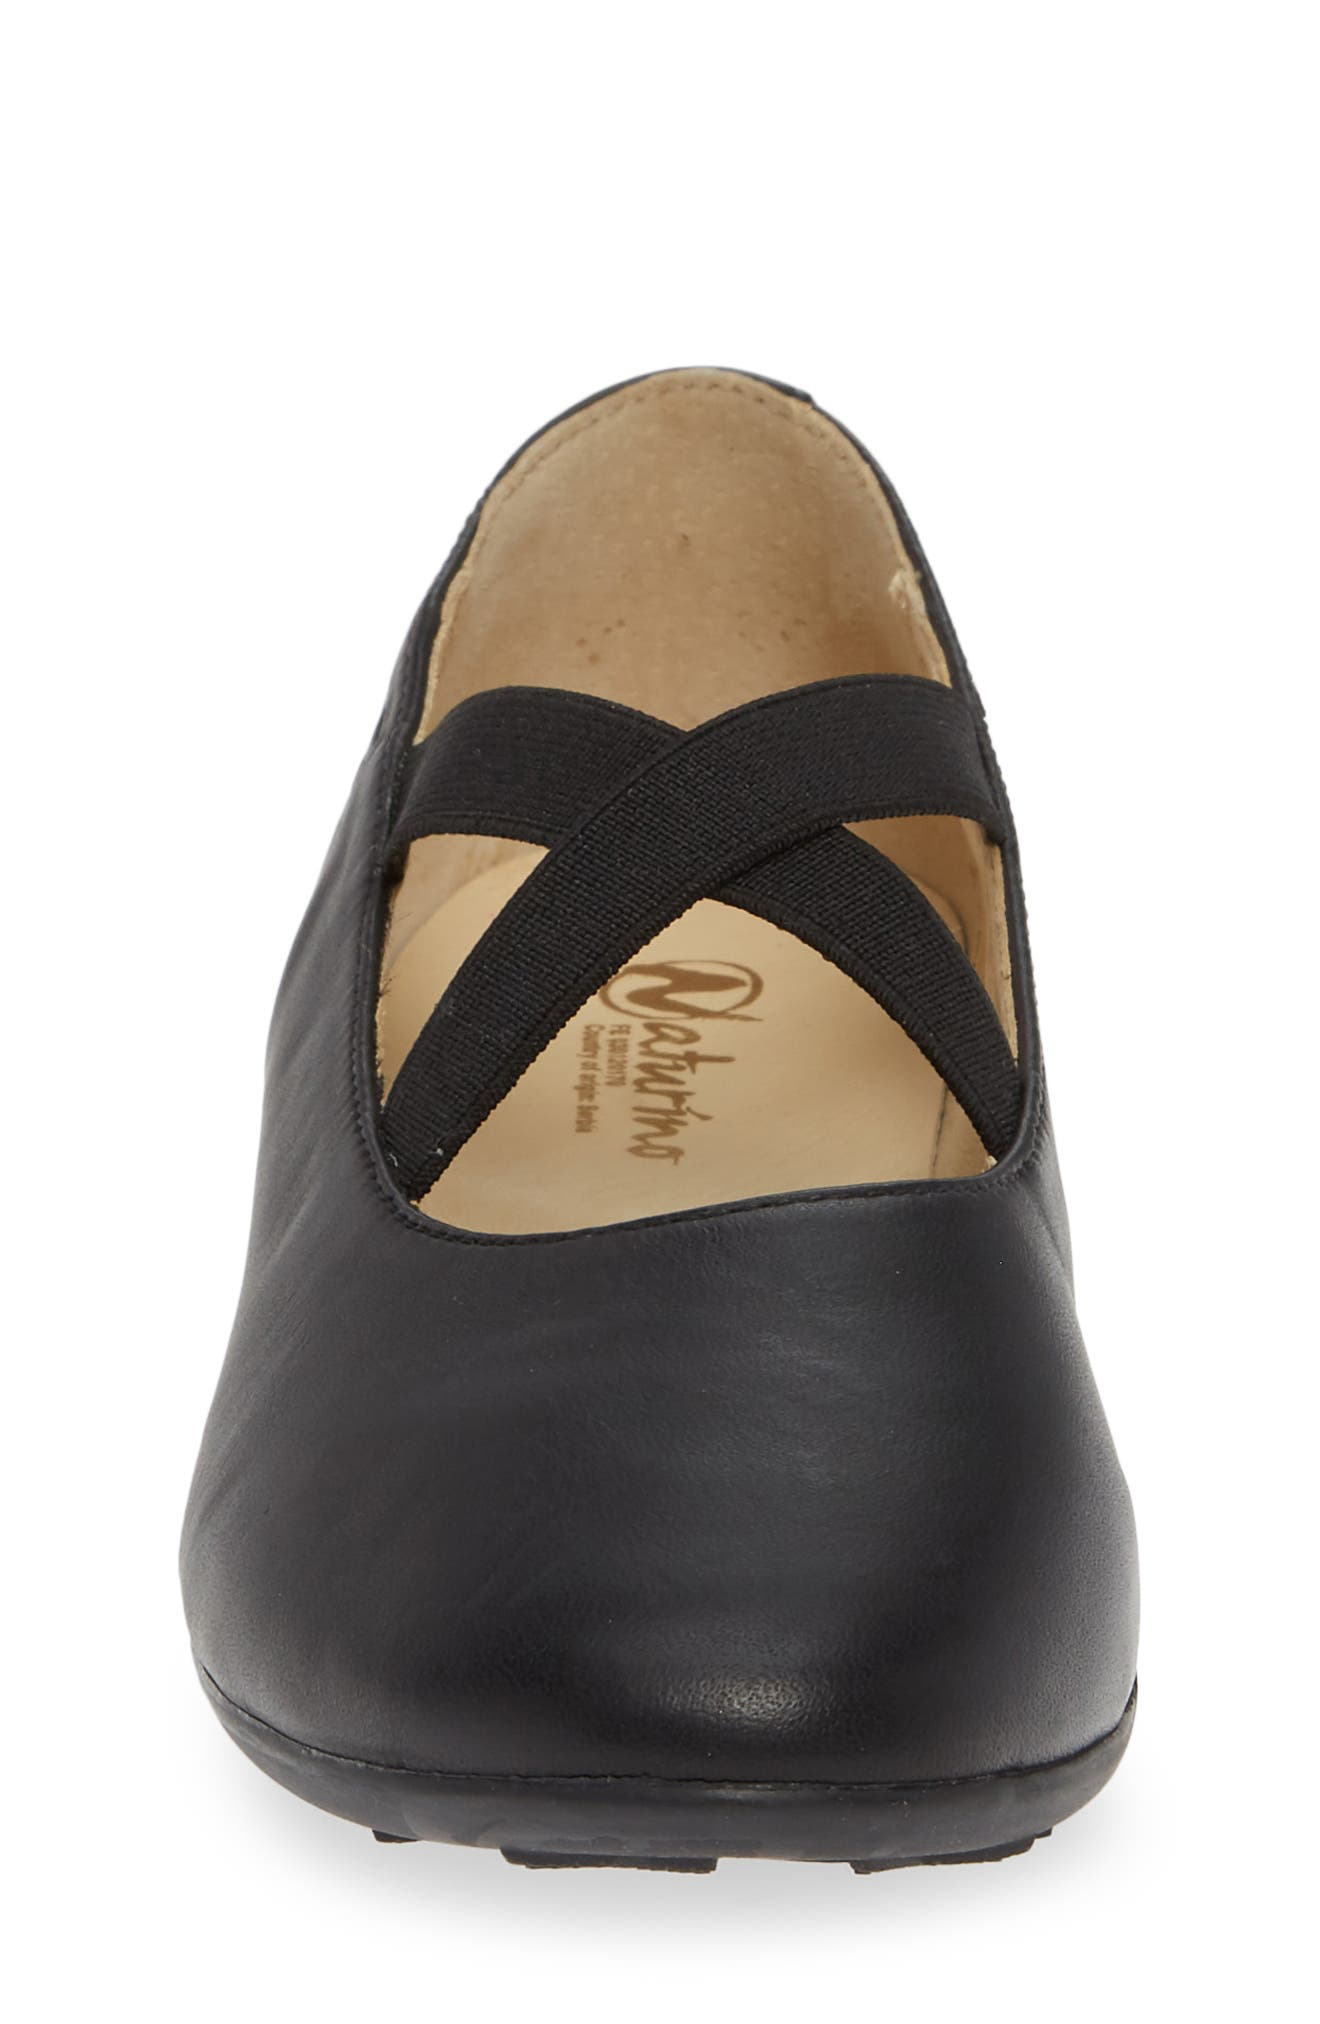 Matera Ballet Flat,                             Alternate thumbnail 3, color,                             Black Leather